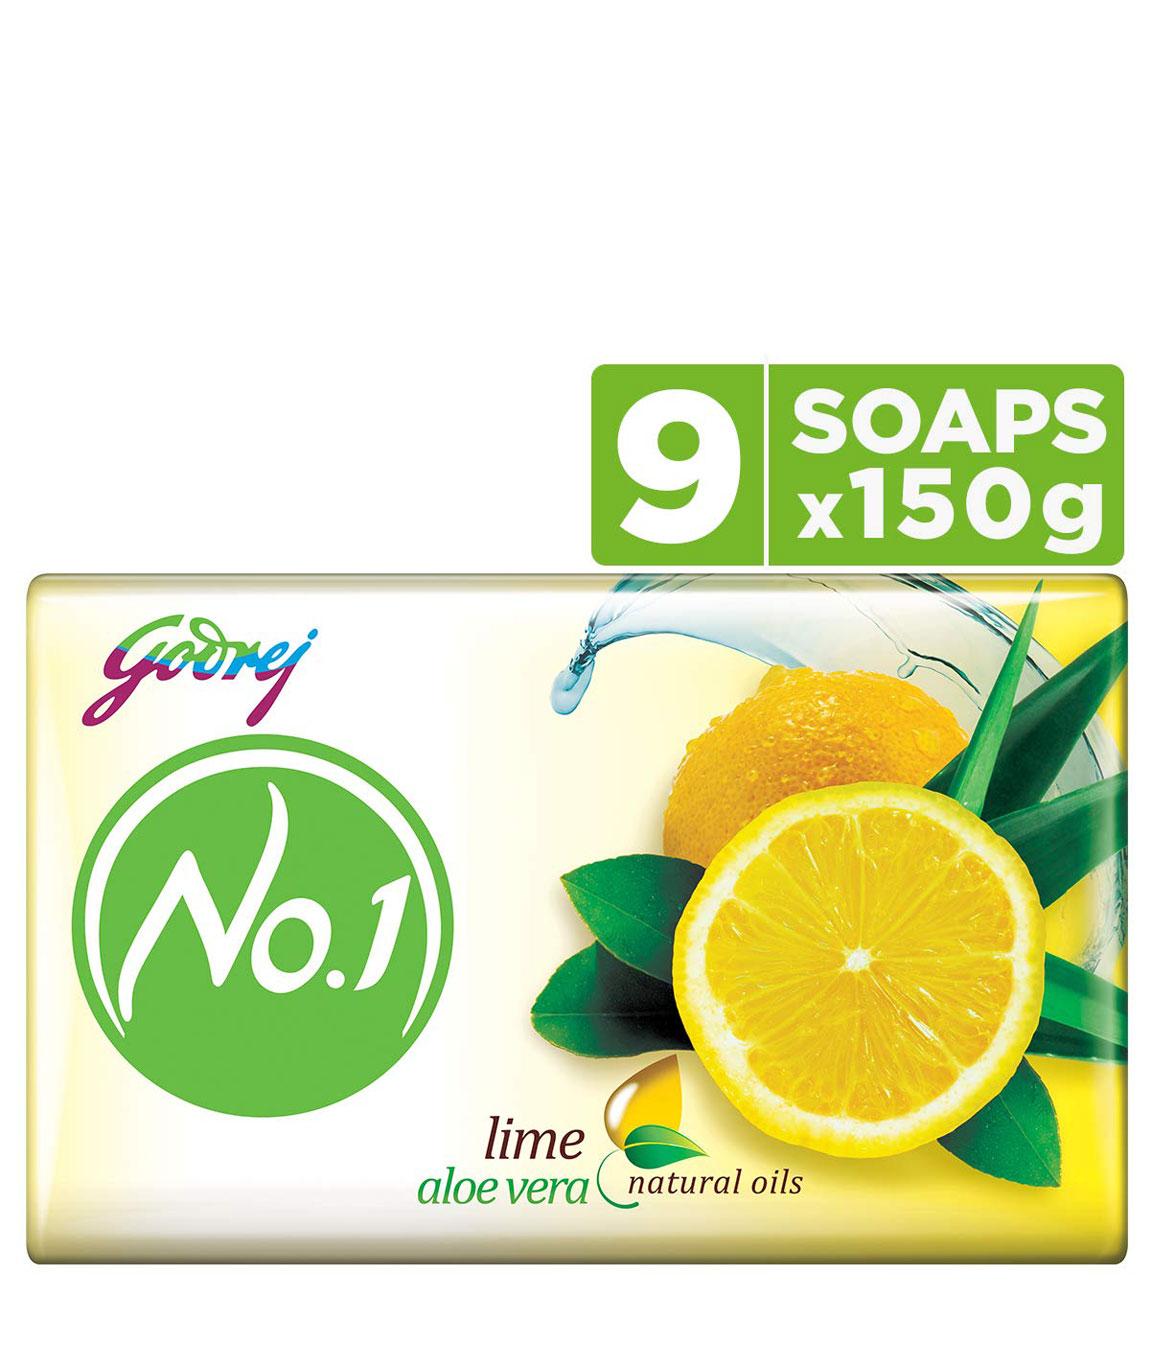 Godrej No.1 Bathing Soap  Lime & Aloe Vera, 150g (Pack of 9)